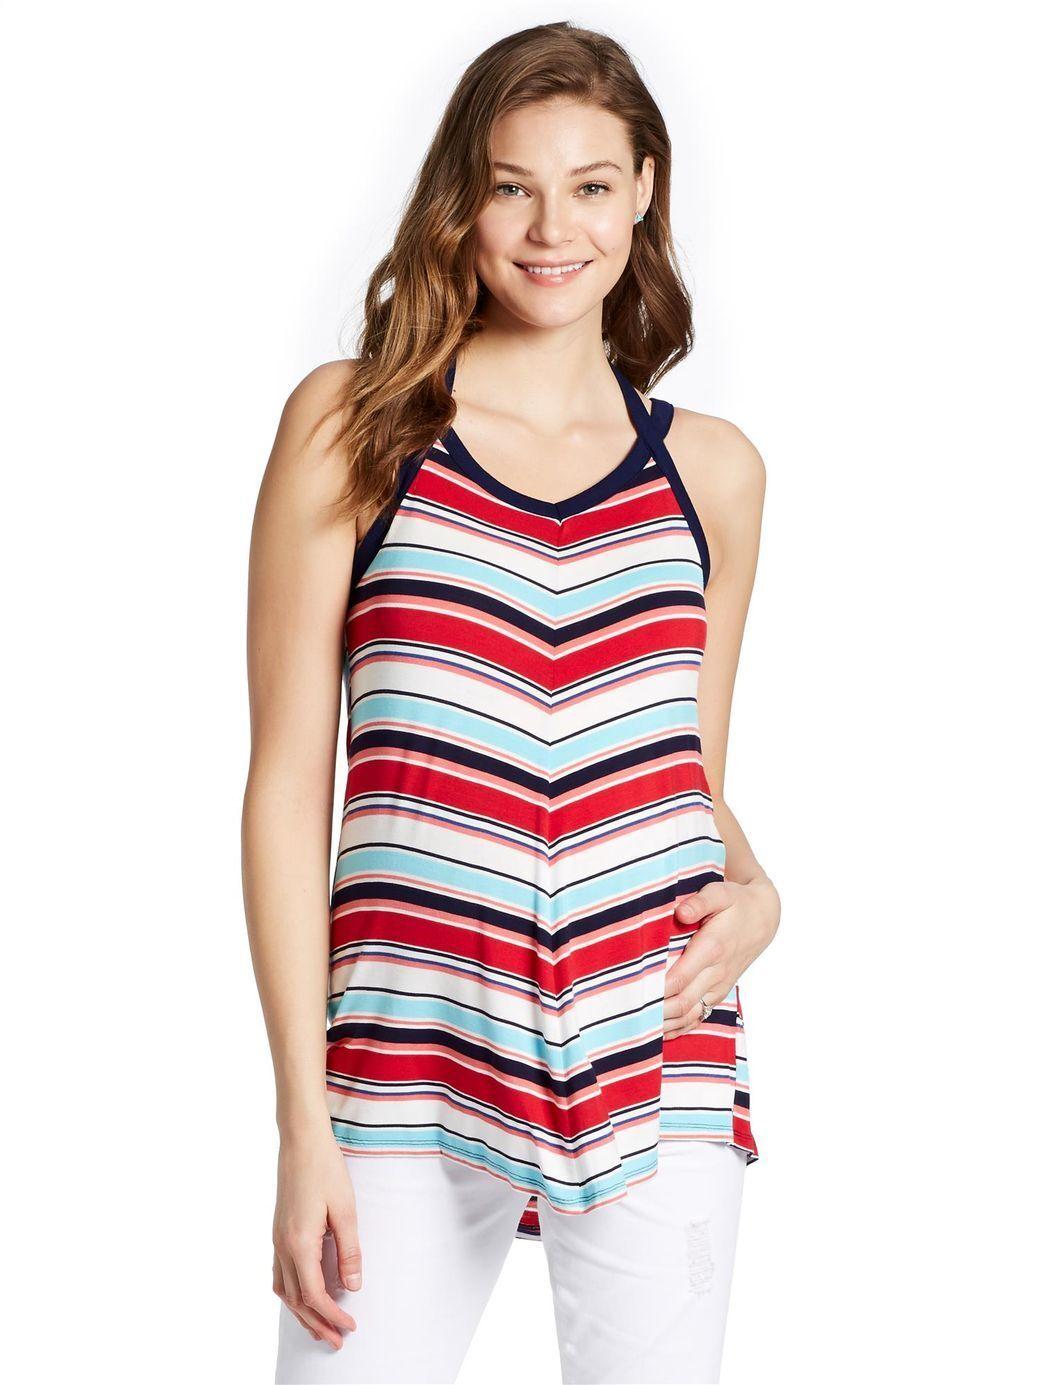 Jessica Simpson Swing Maternity Tank Top   Small   BNWT